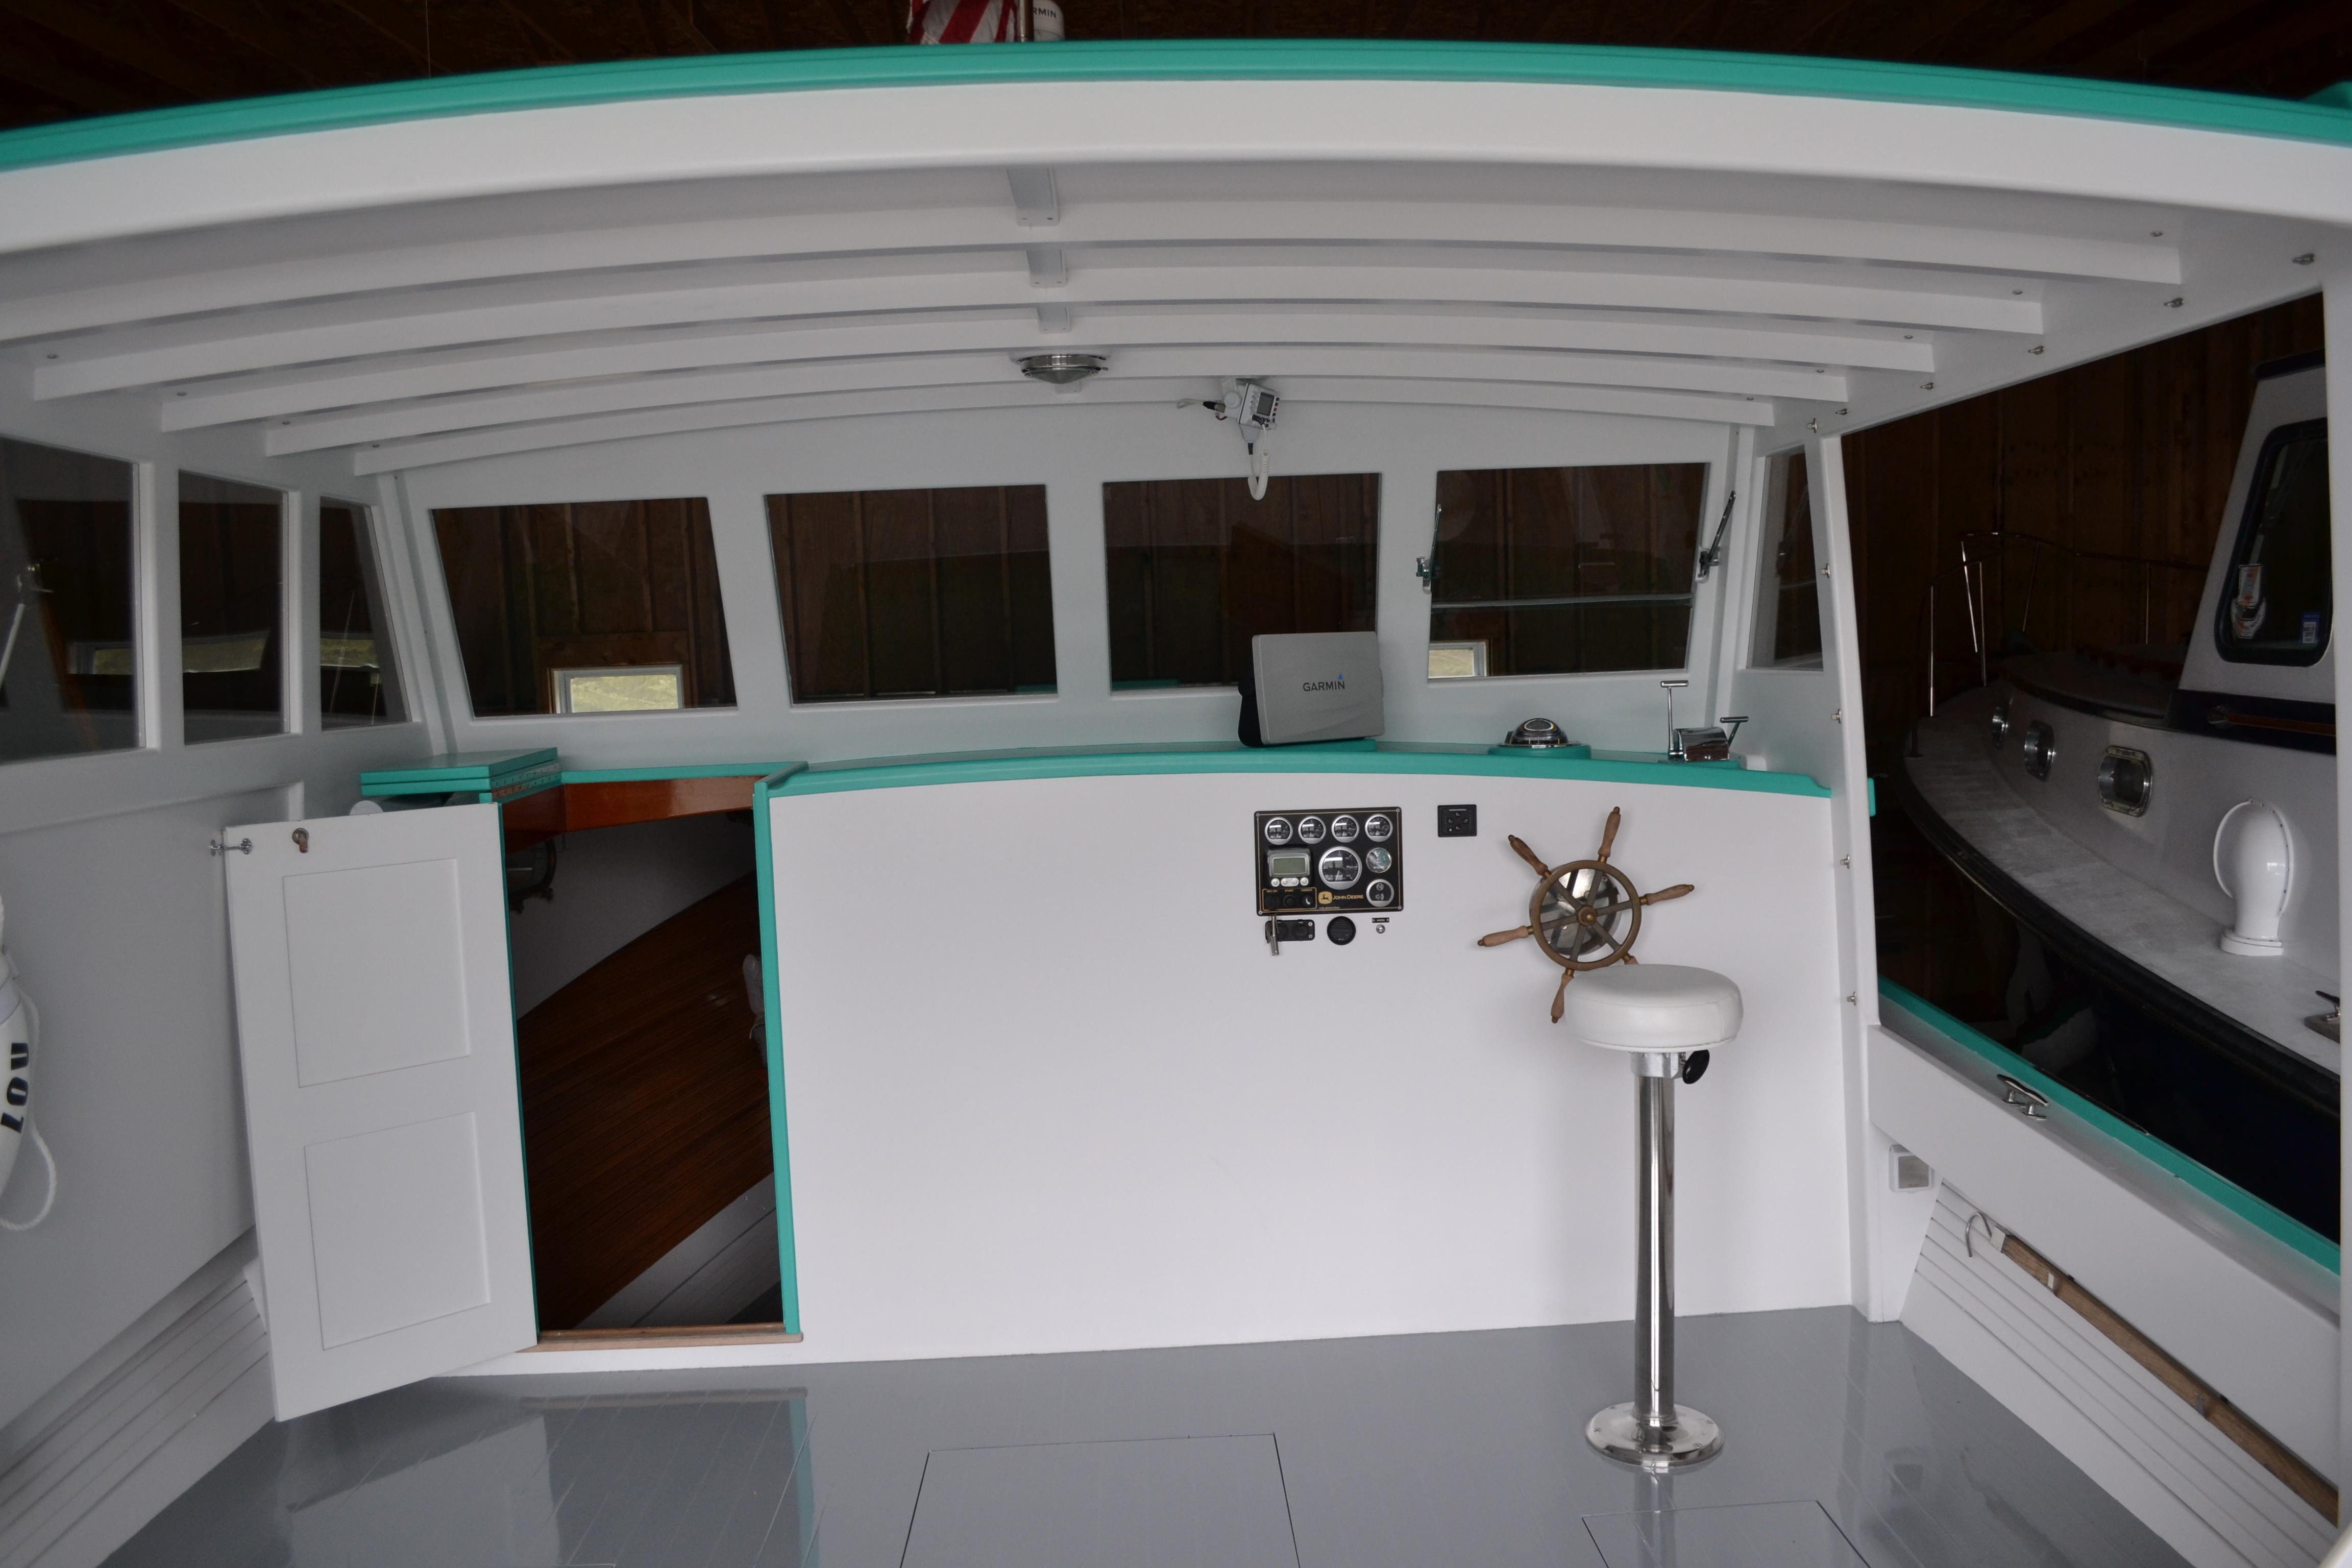 Steering bulkhead